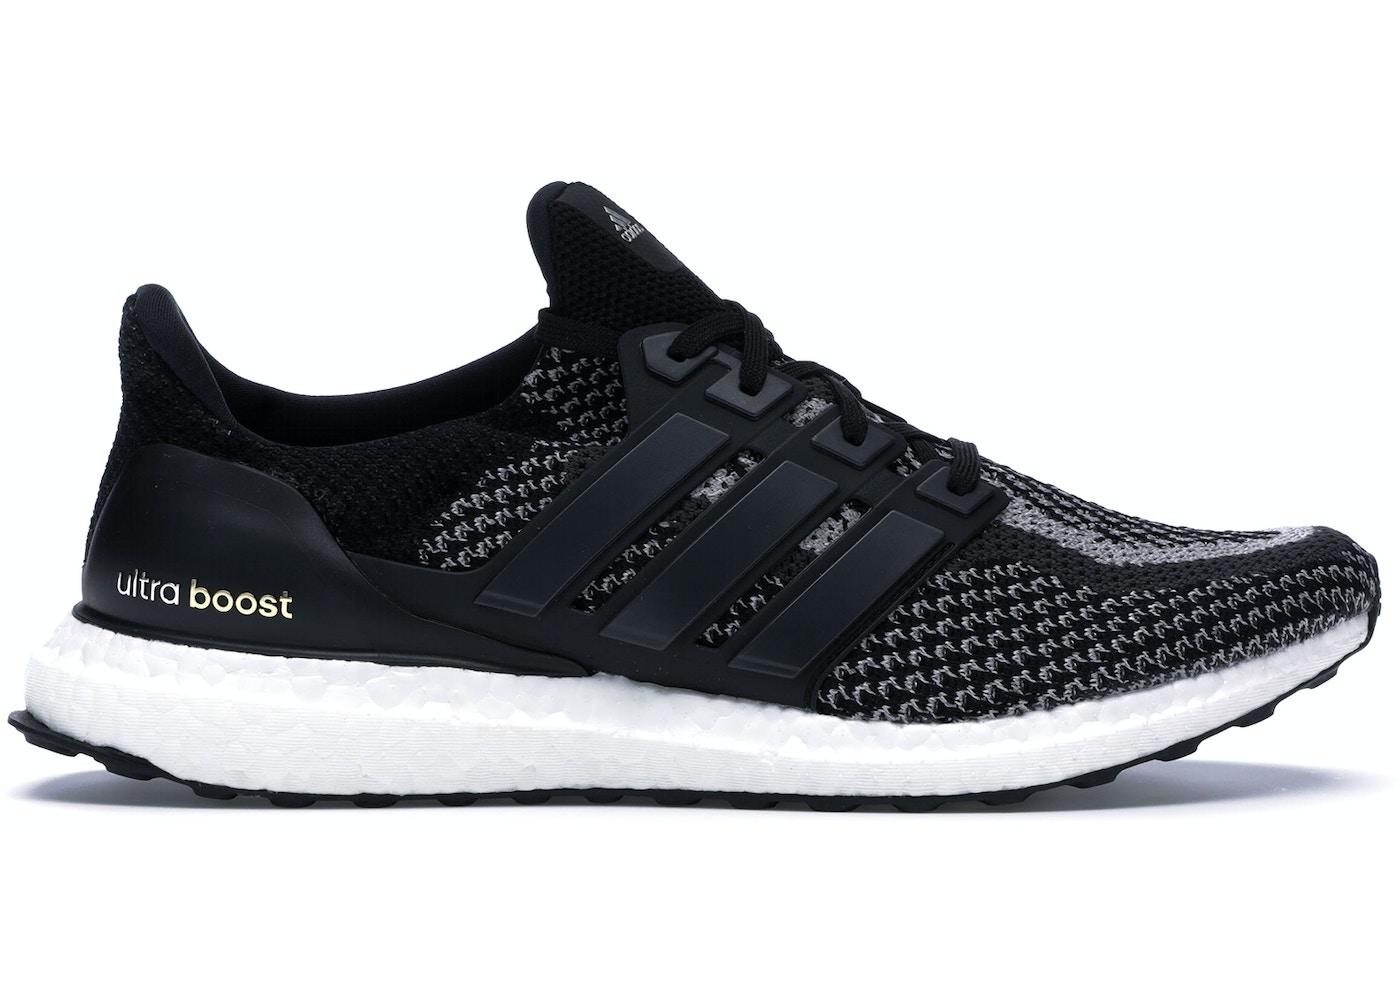 9420227bfdb49 adidas Ultra Boost 2.0 Black Reflective - BY1795